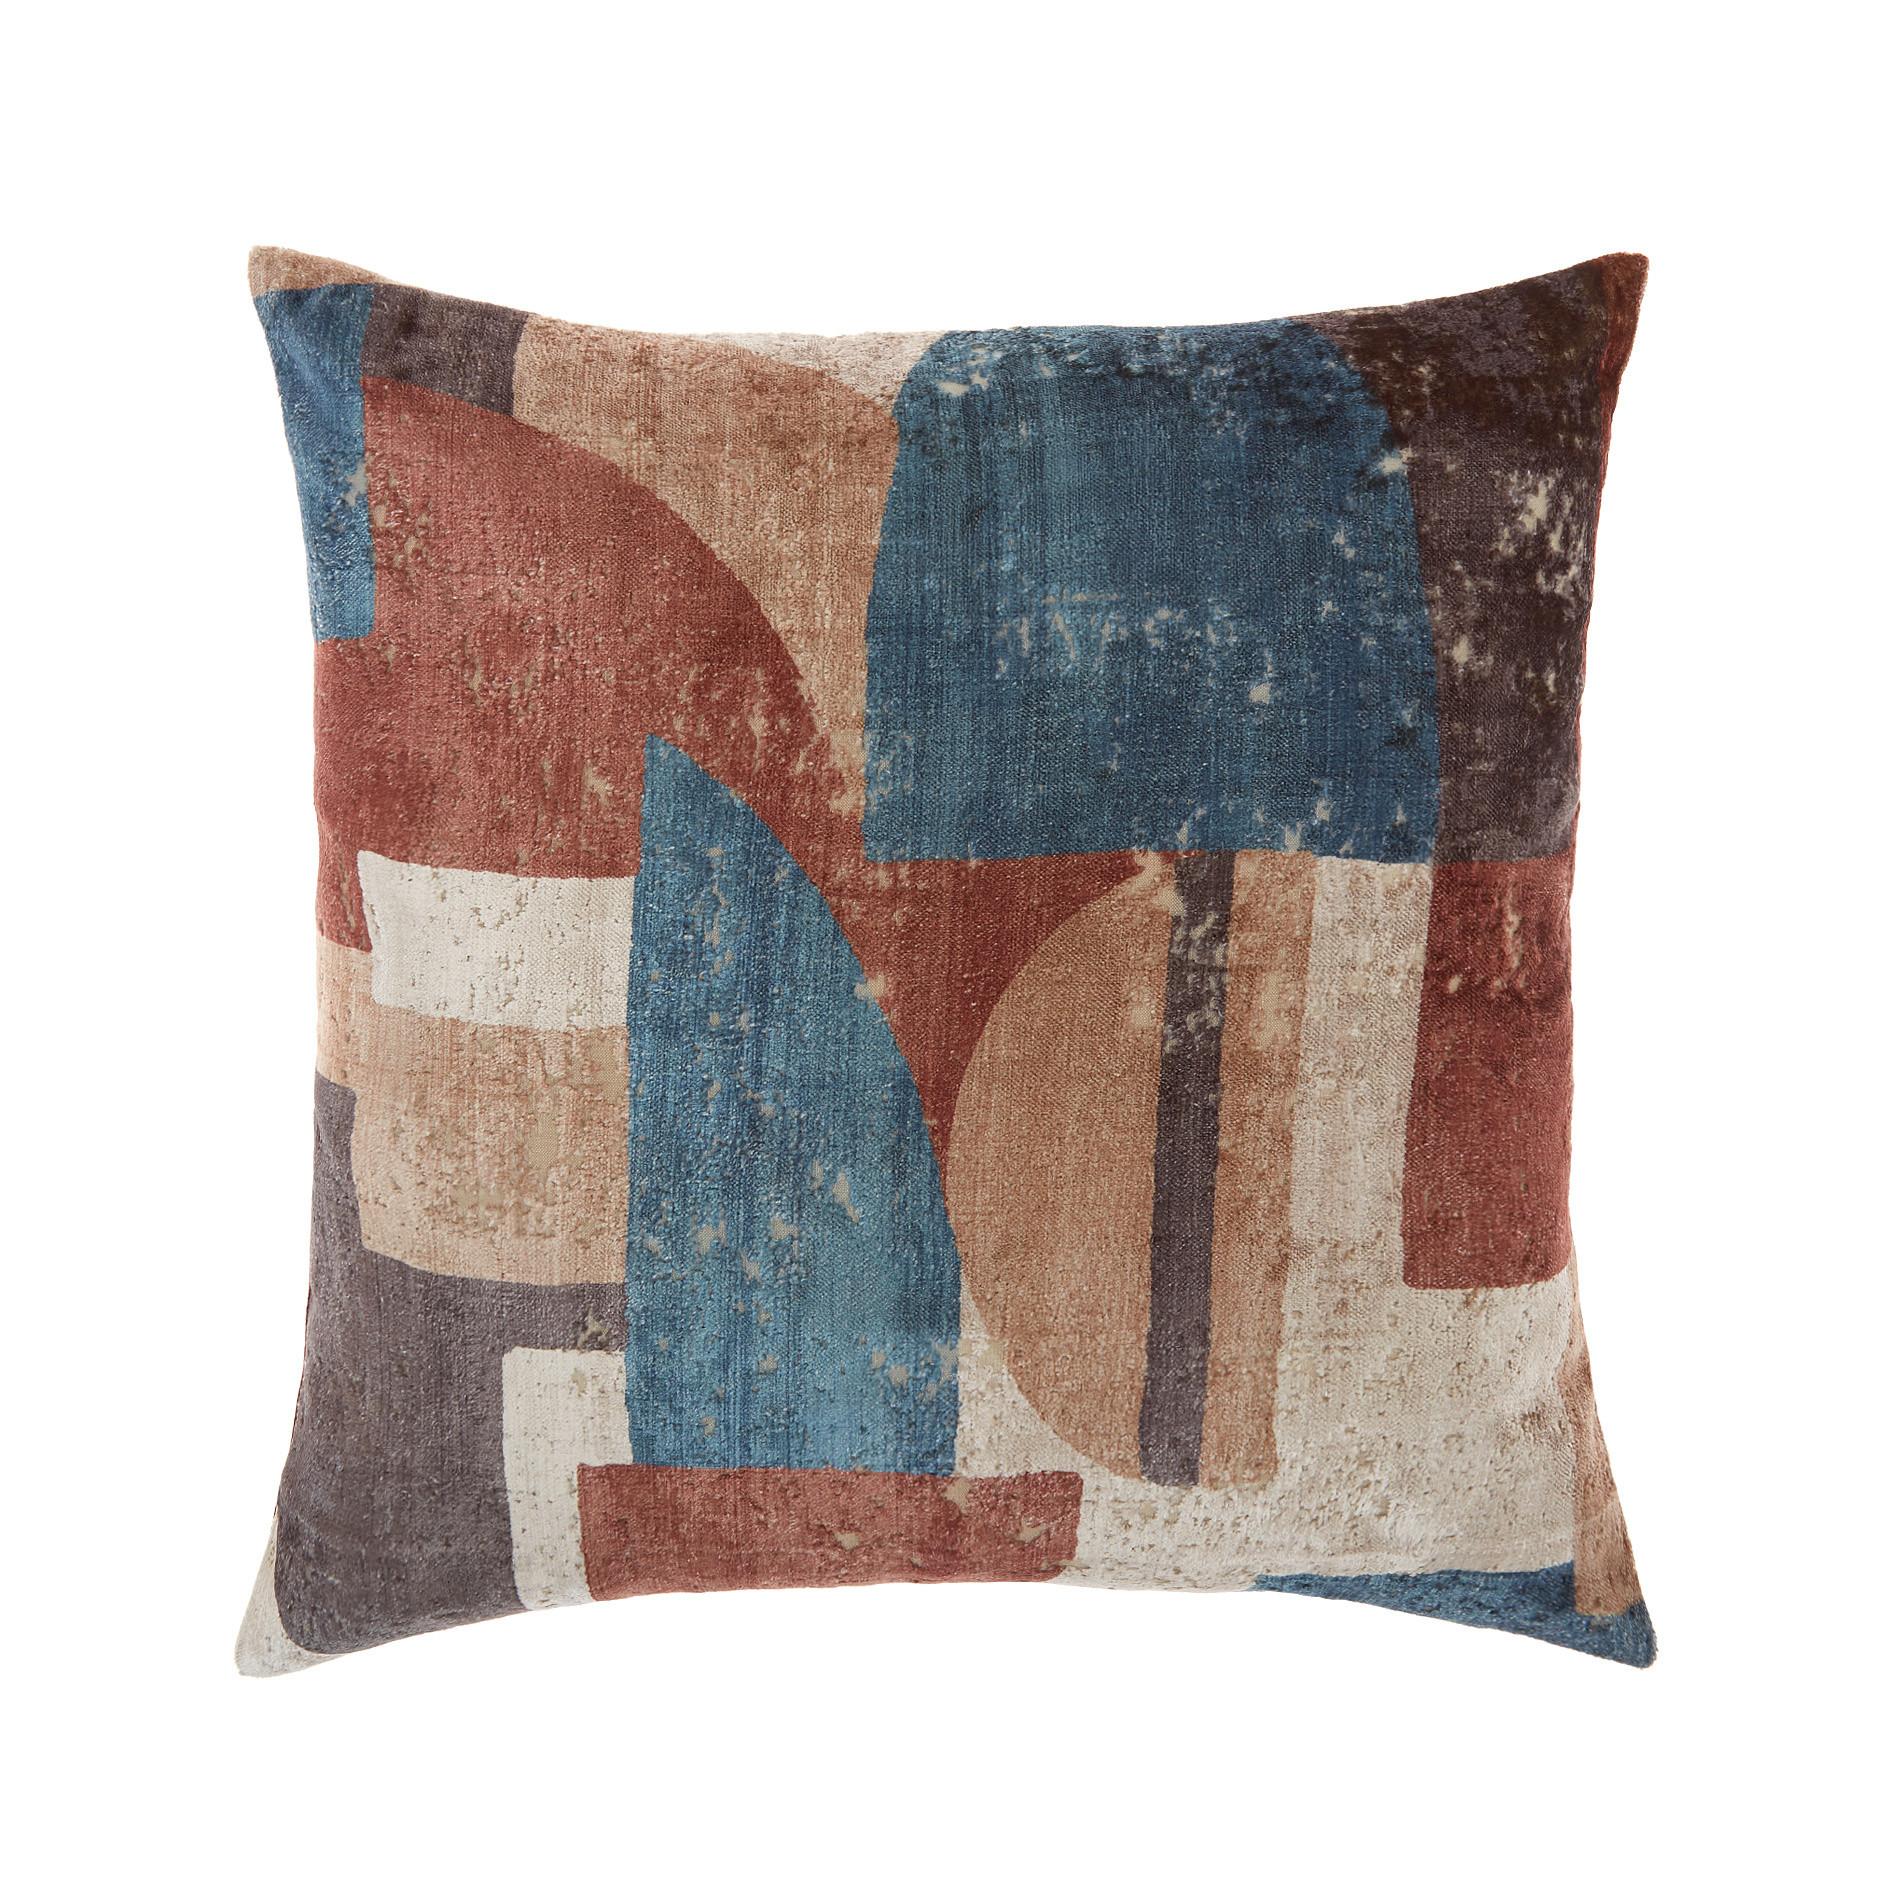 Cuscino velluto motivo geometrico 45x45cm, Marrone, large image number 0